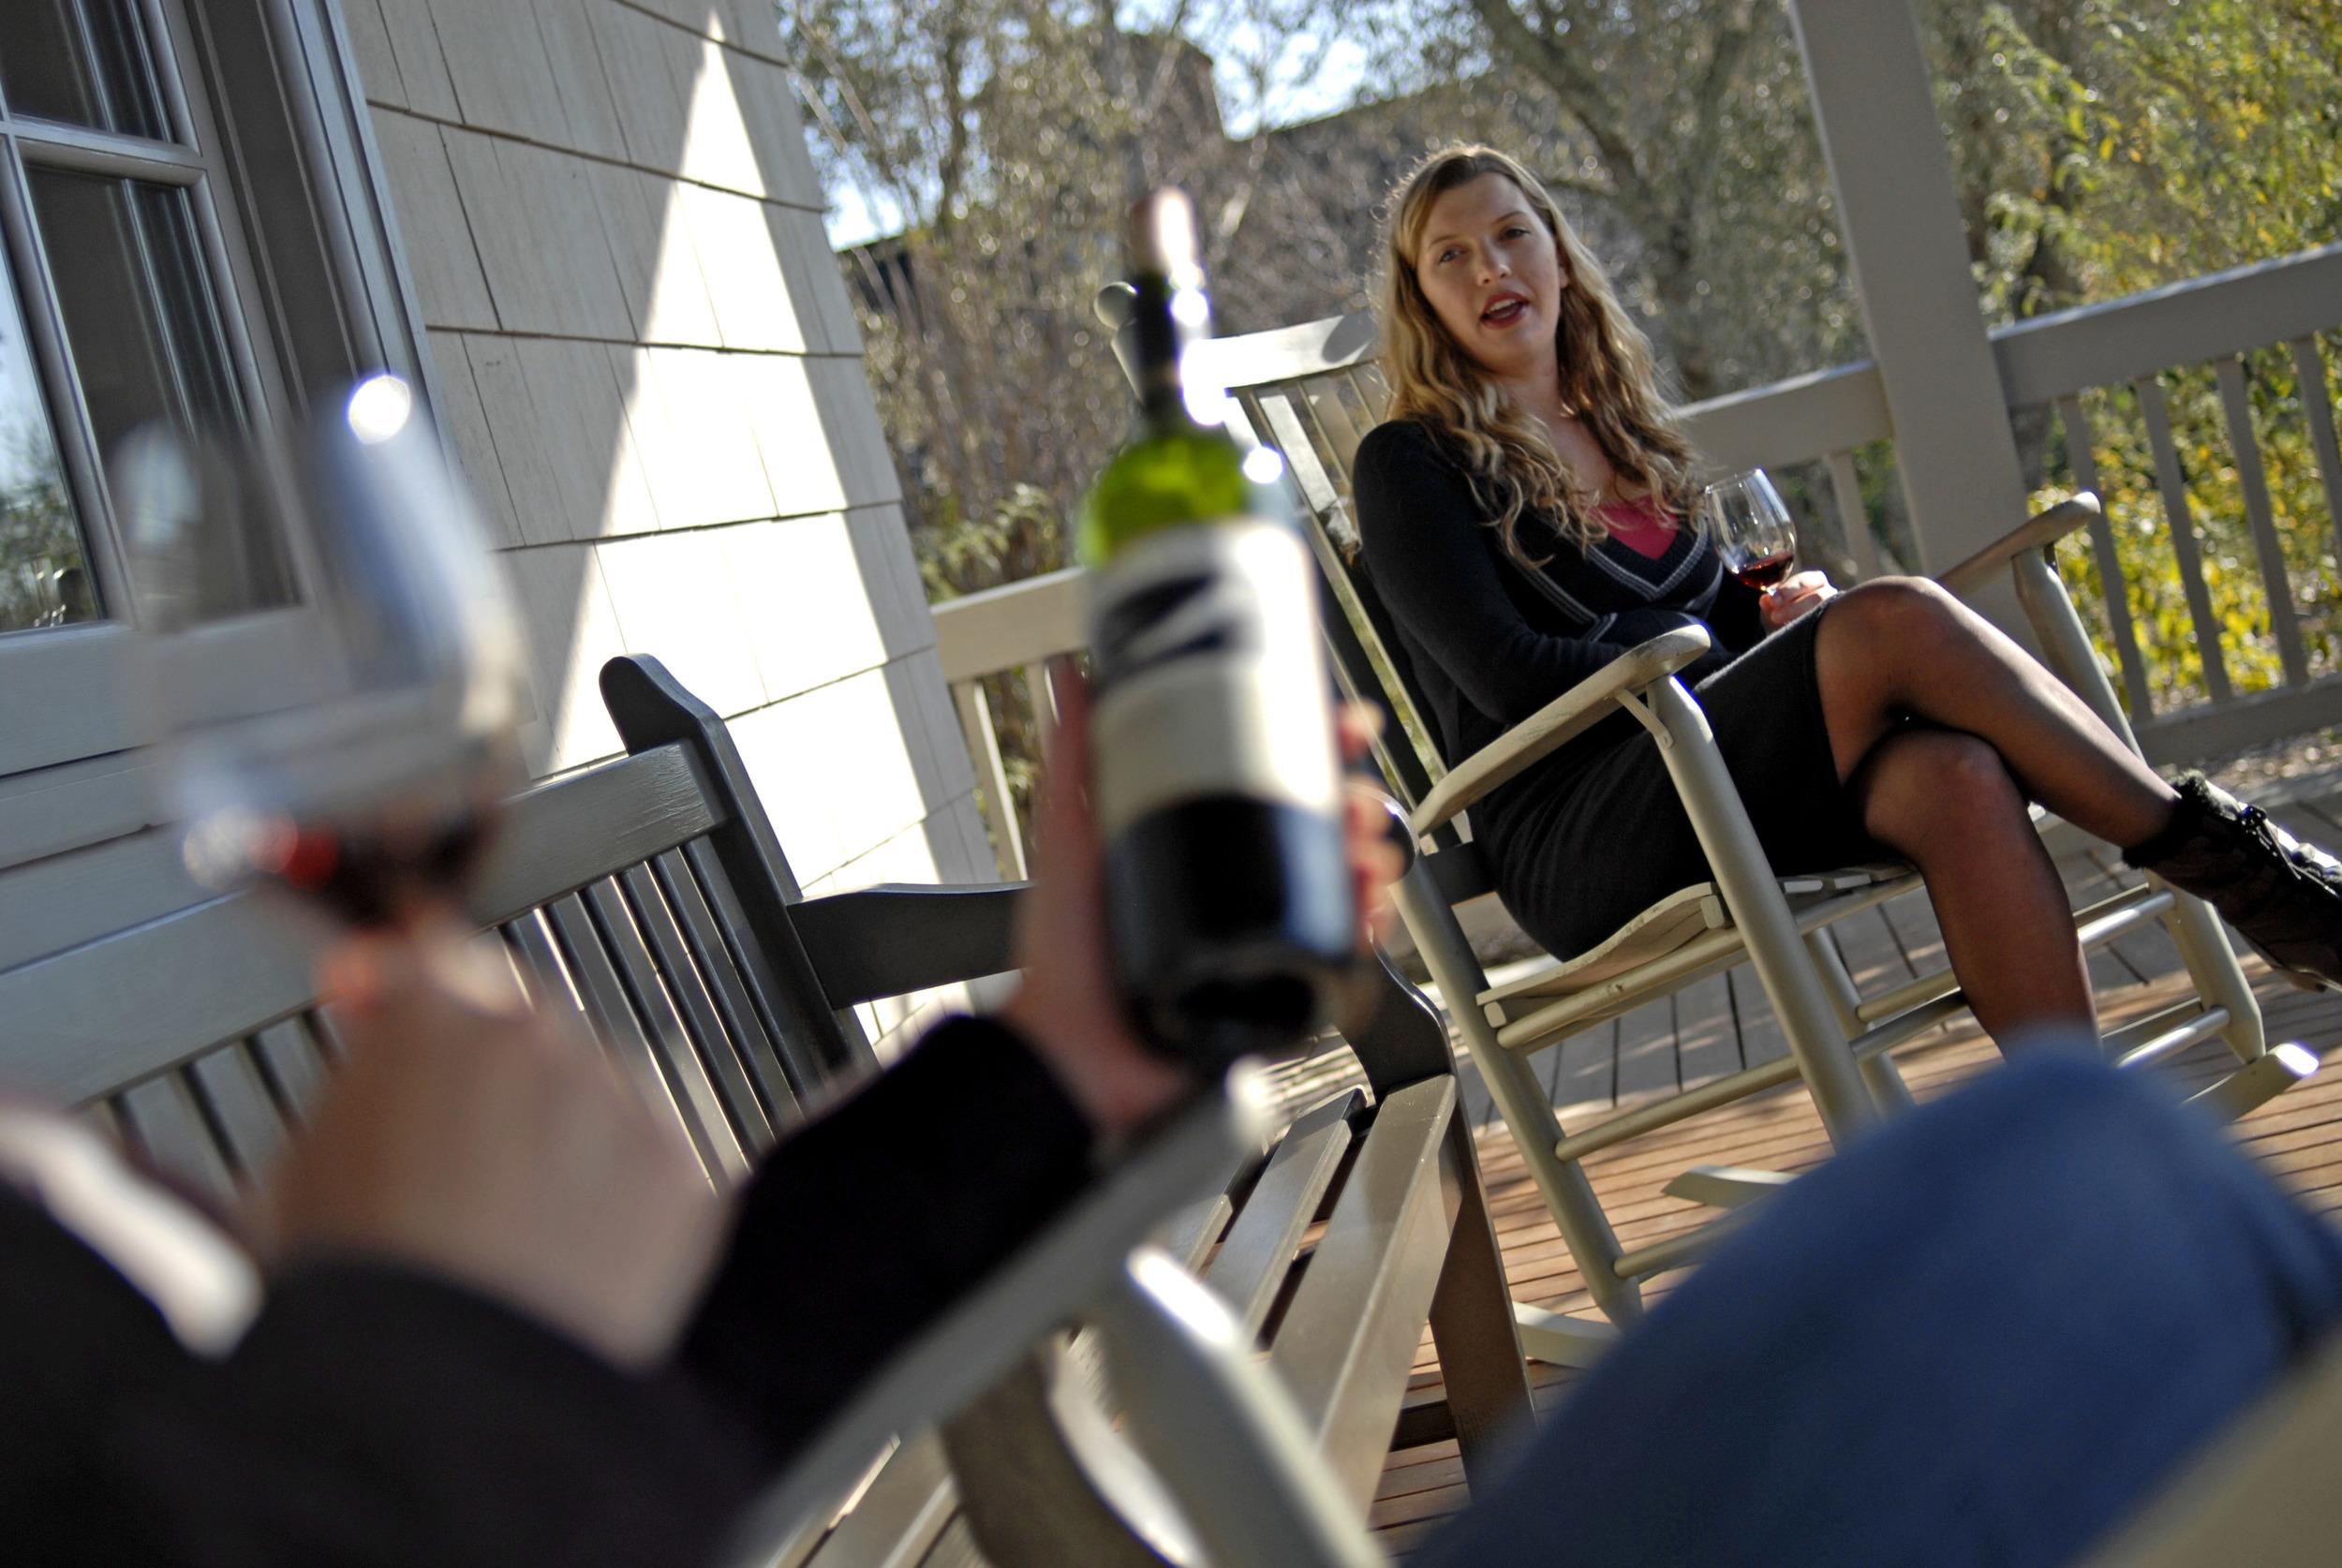 Drinking wine at Frog's Leap vineyard porch-2.jpg